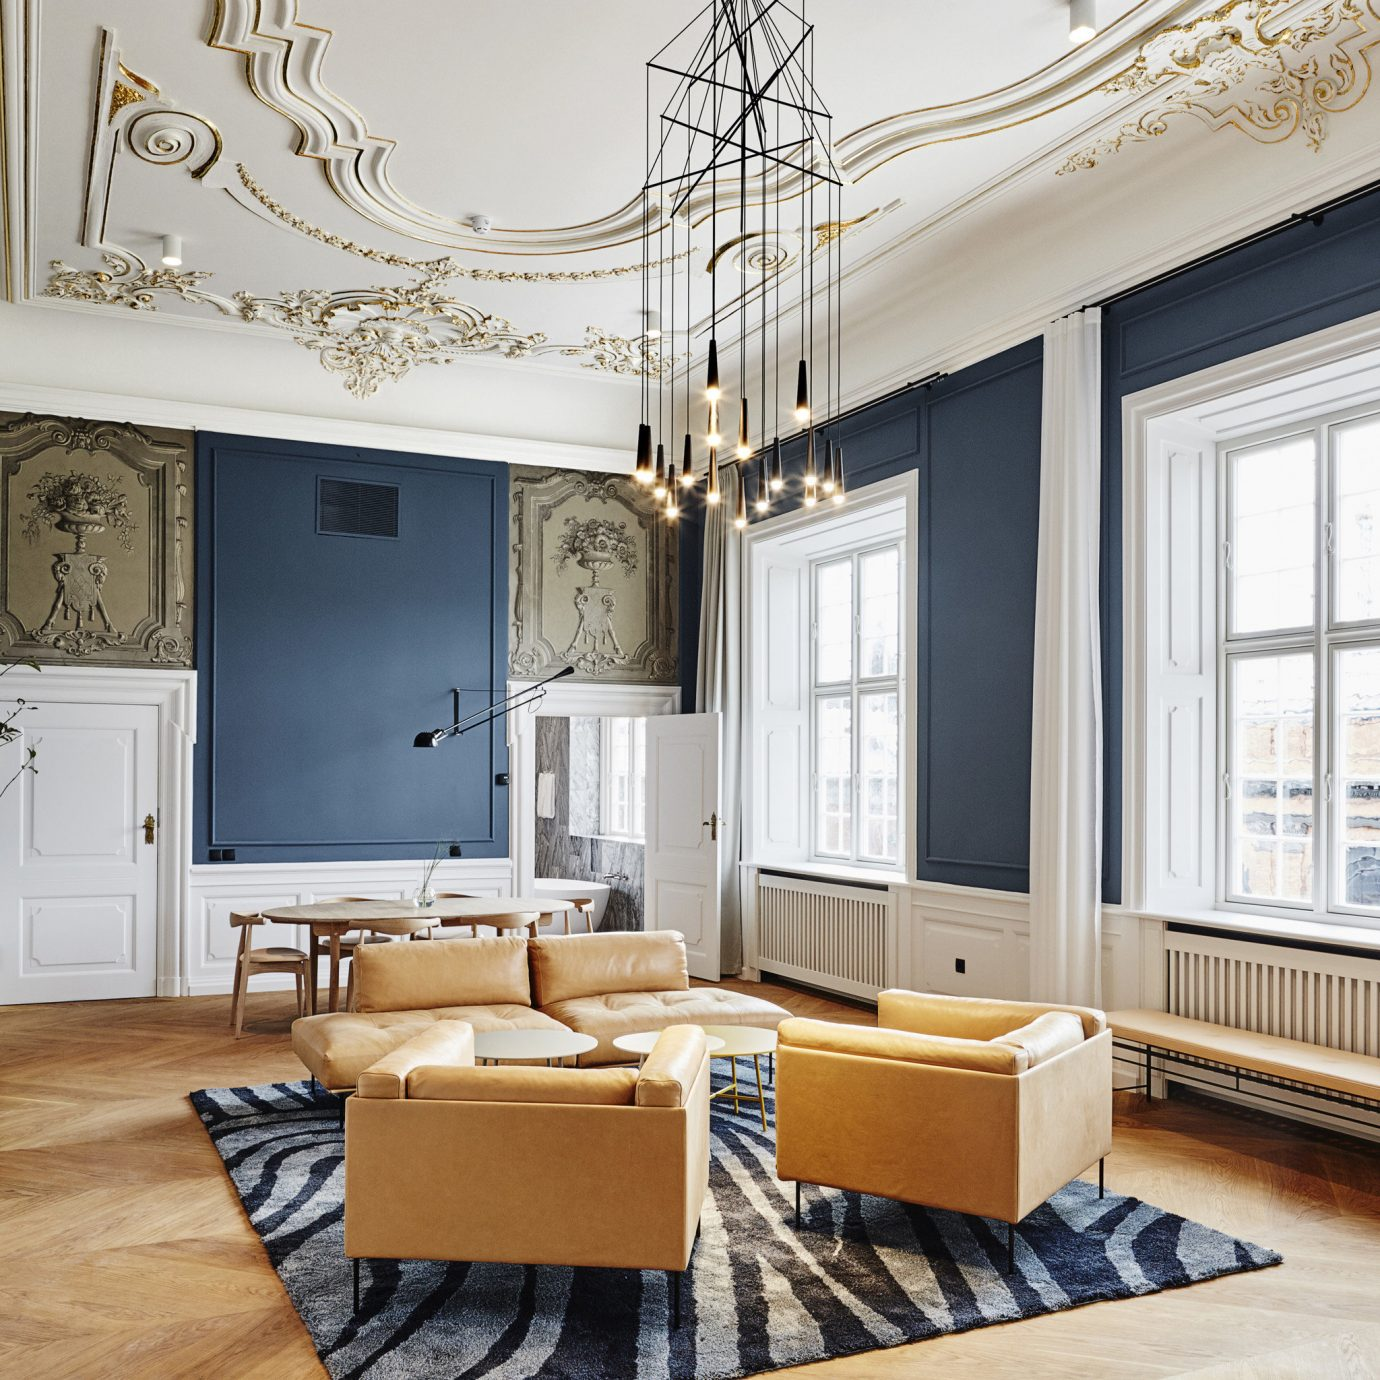 Beach Boutique Hotels Copenhagen Denmark Hotels Summer Travel Trip Ideas living room home interior designer loft flooring